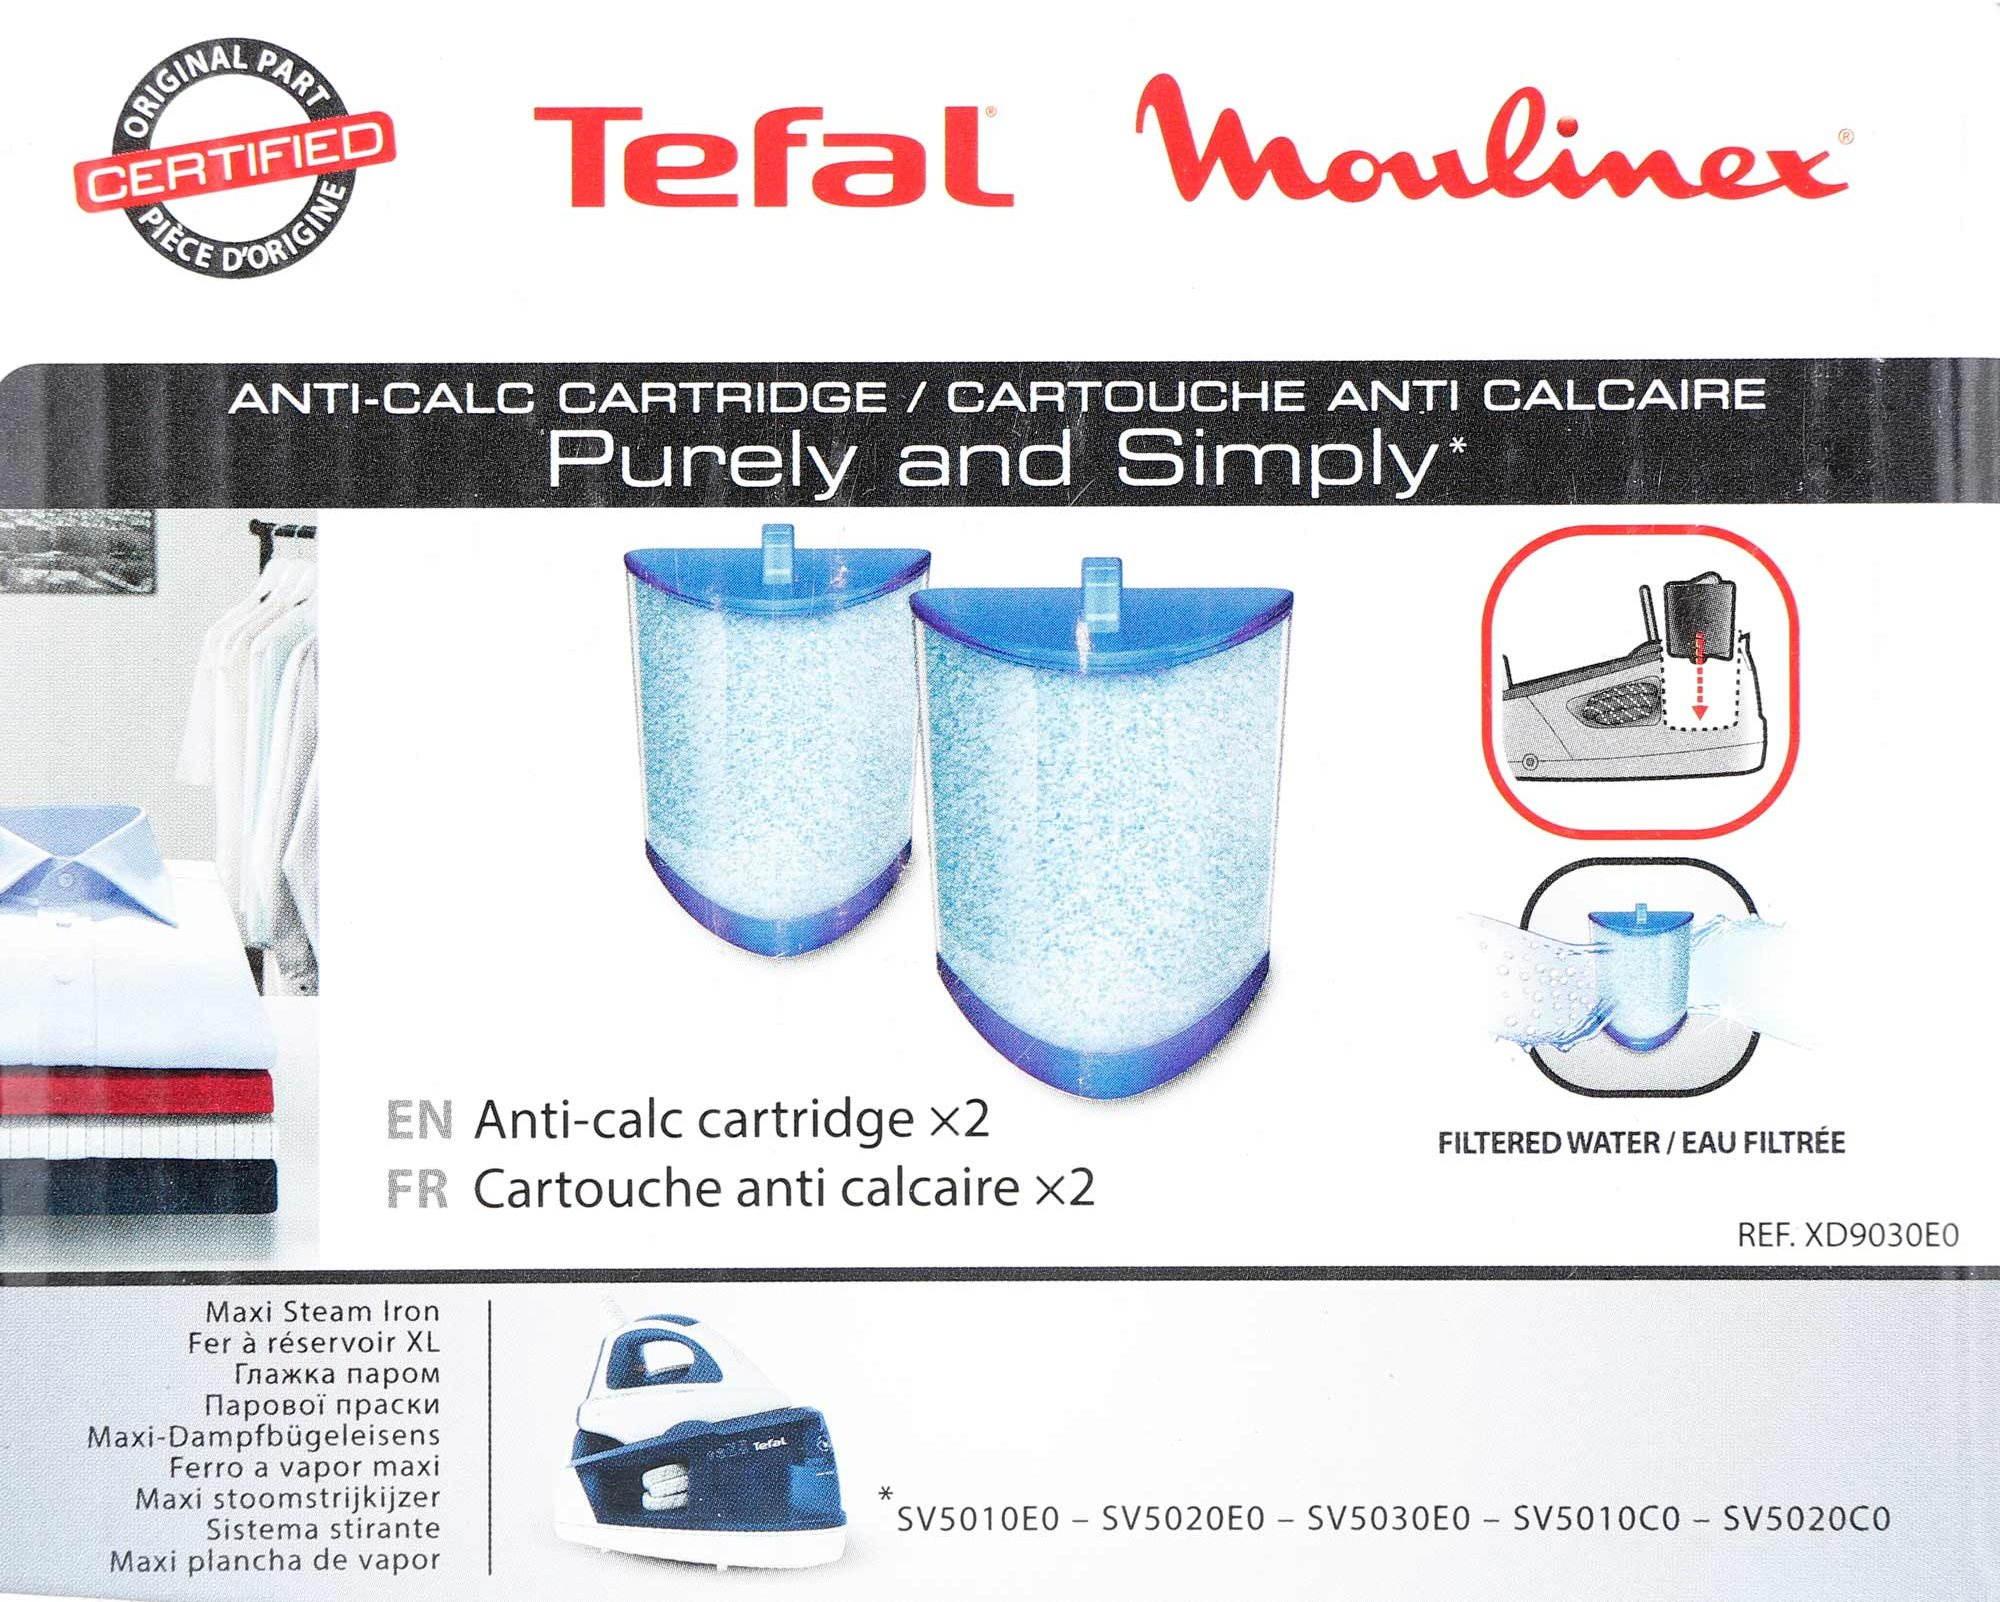 Tefal XD9030 Anti Calc Cartridge